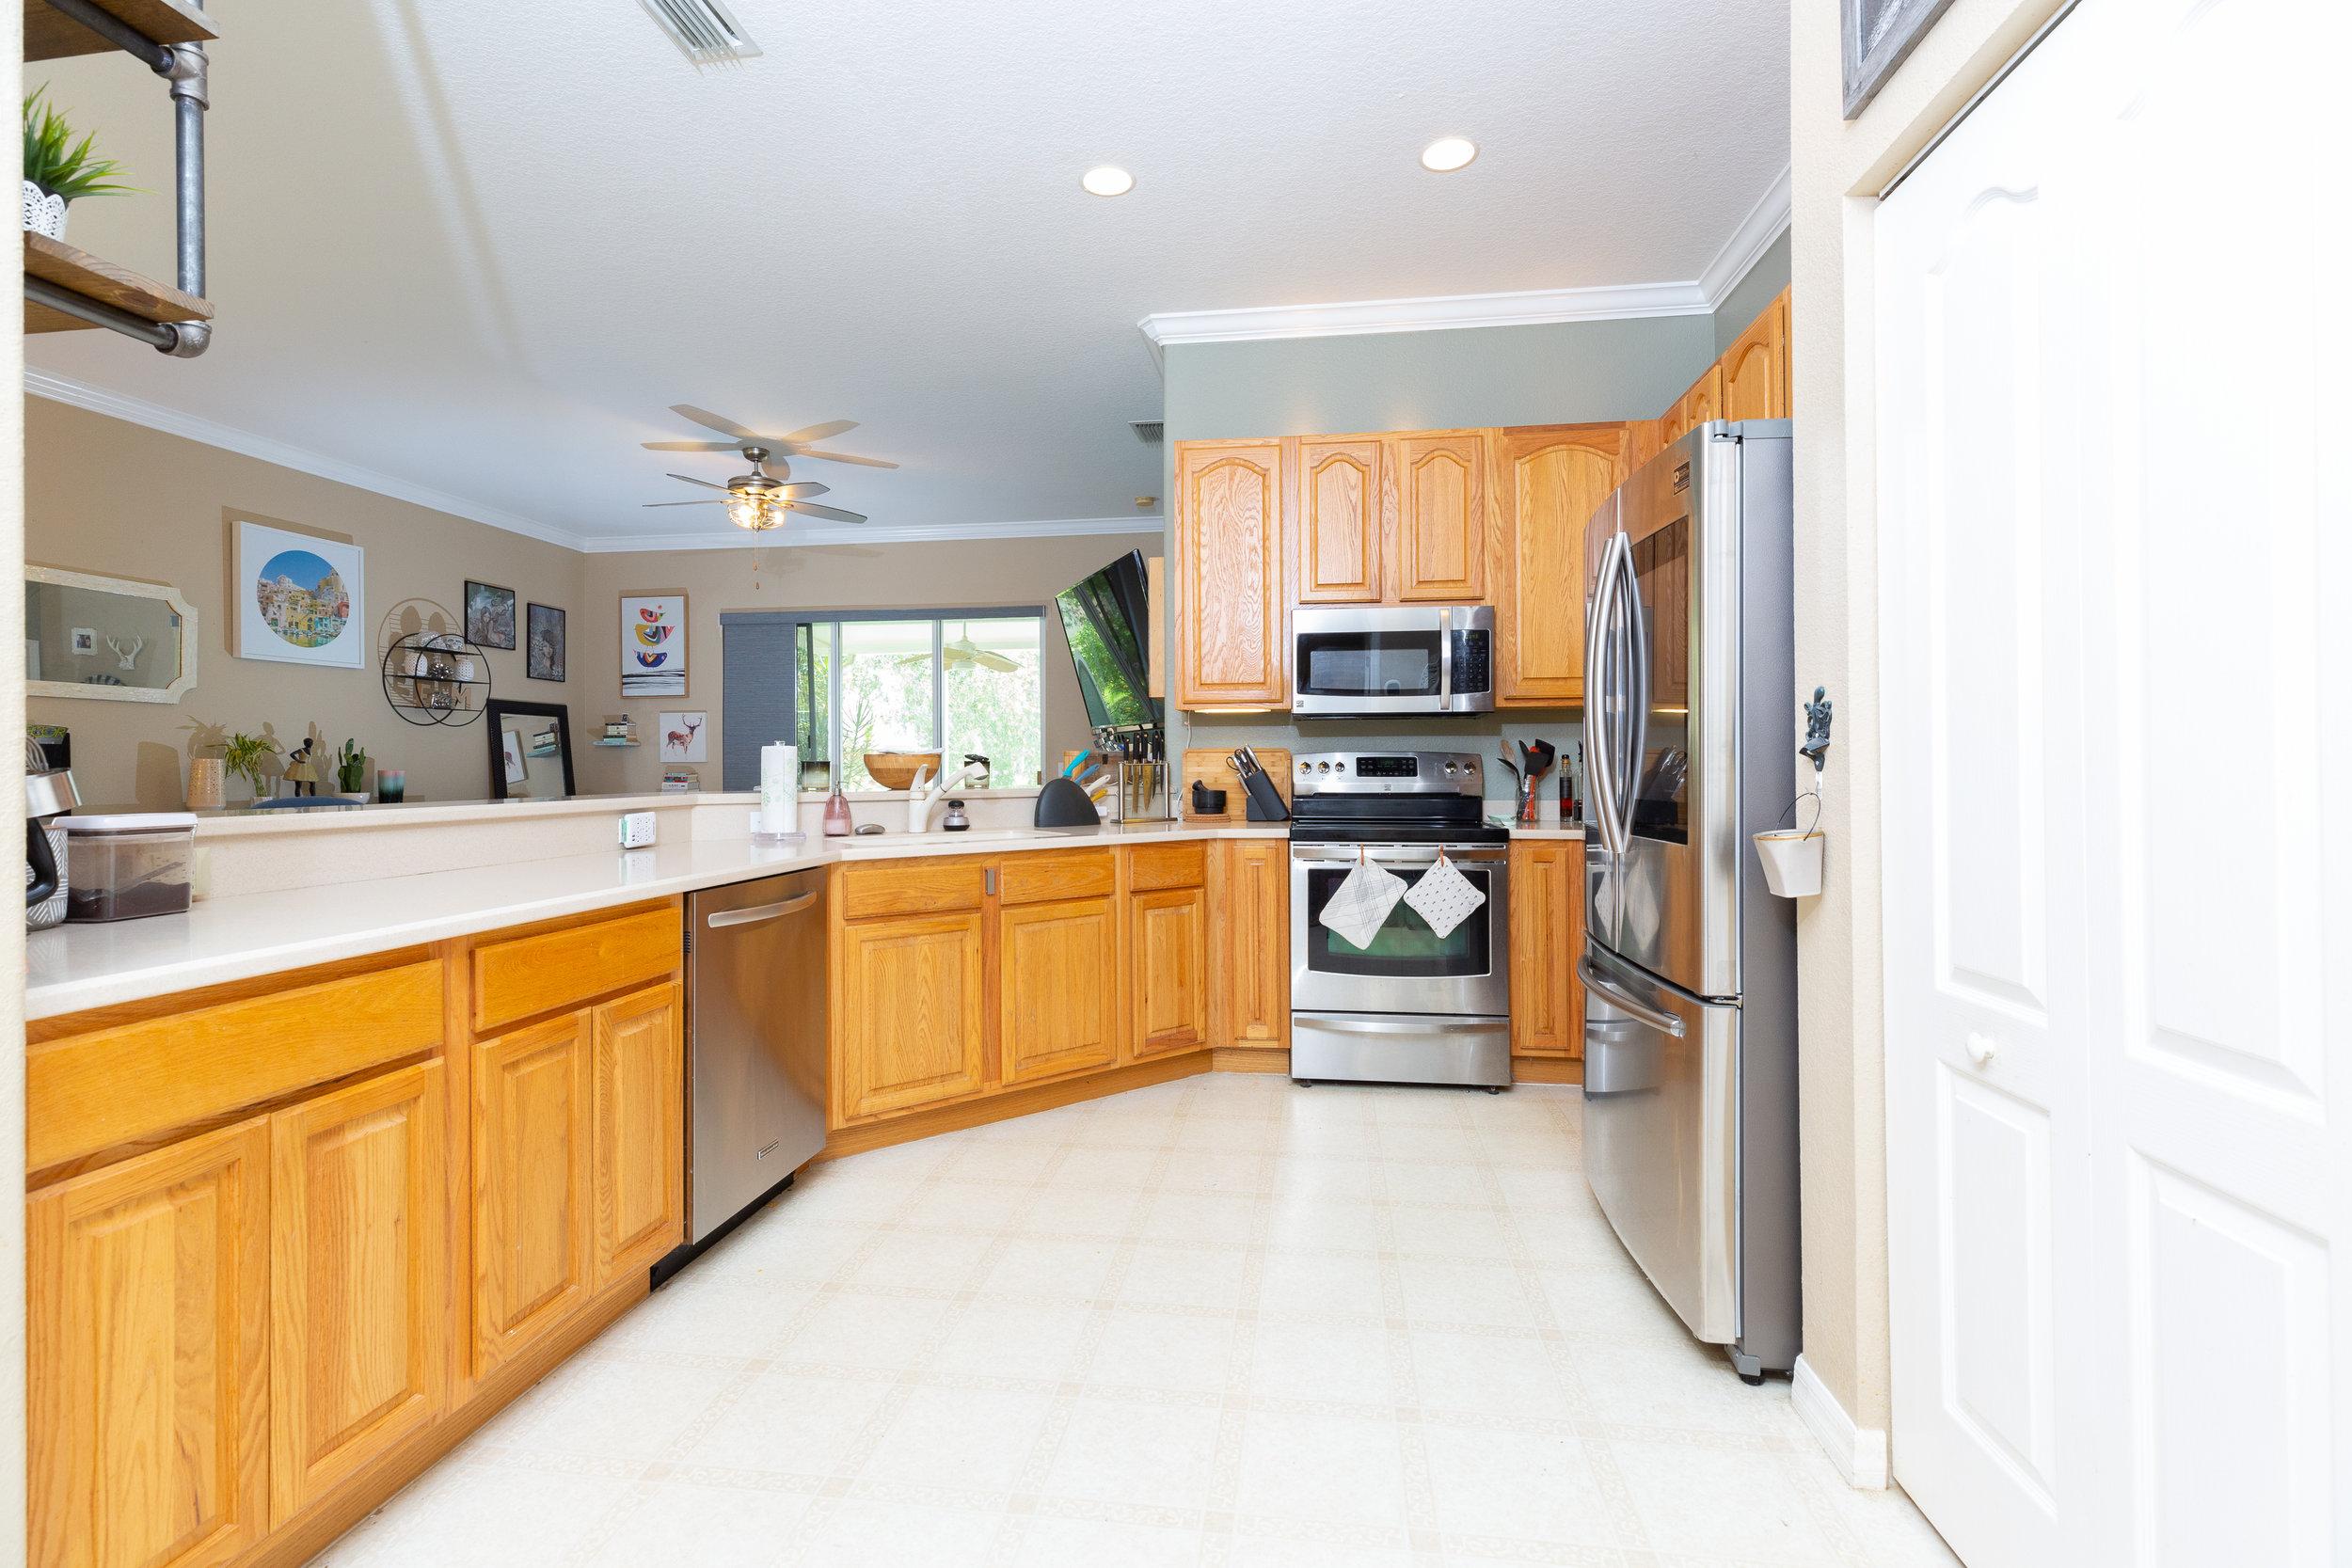 Kitchen_I66A1790.jpg